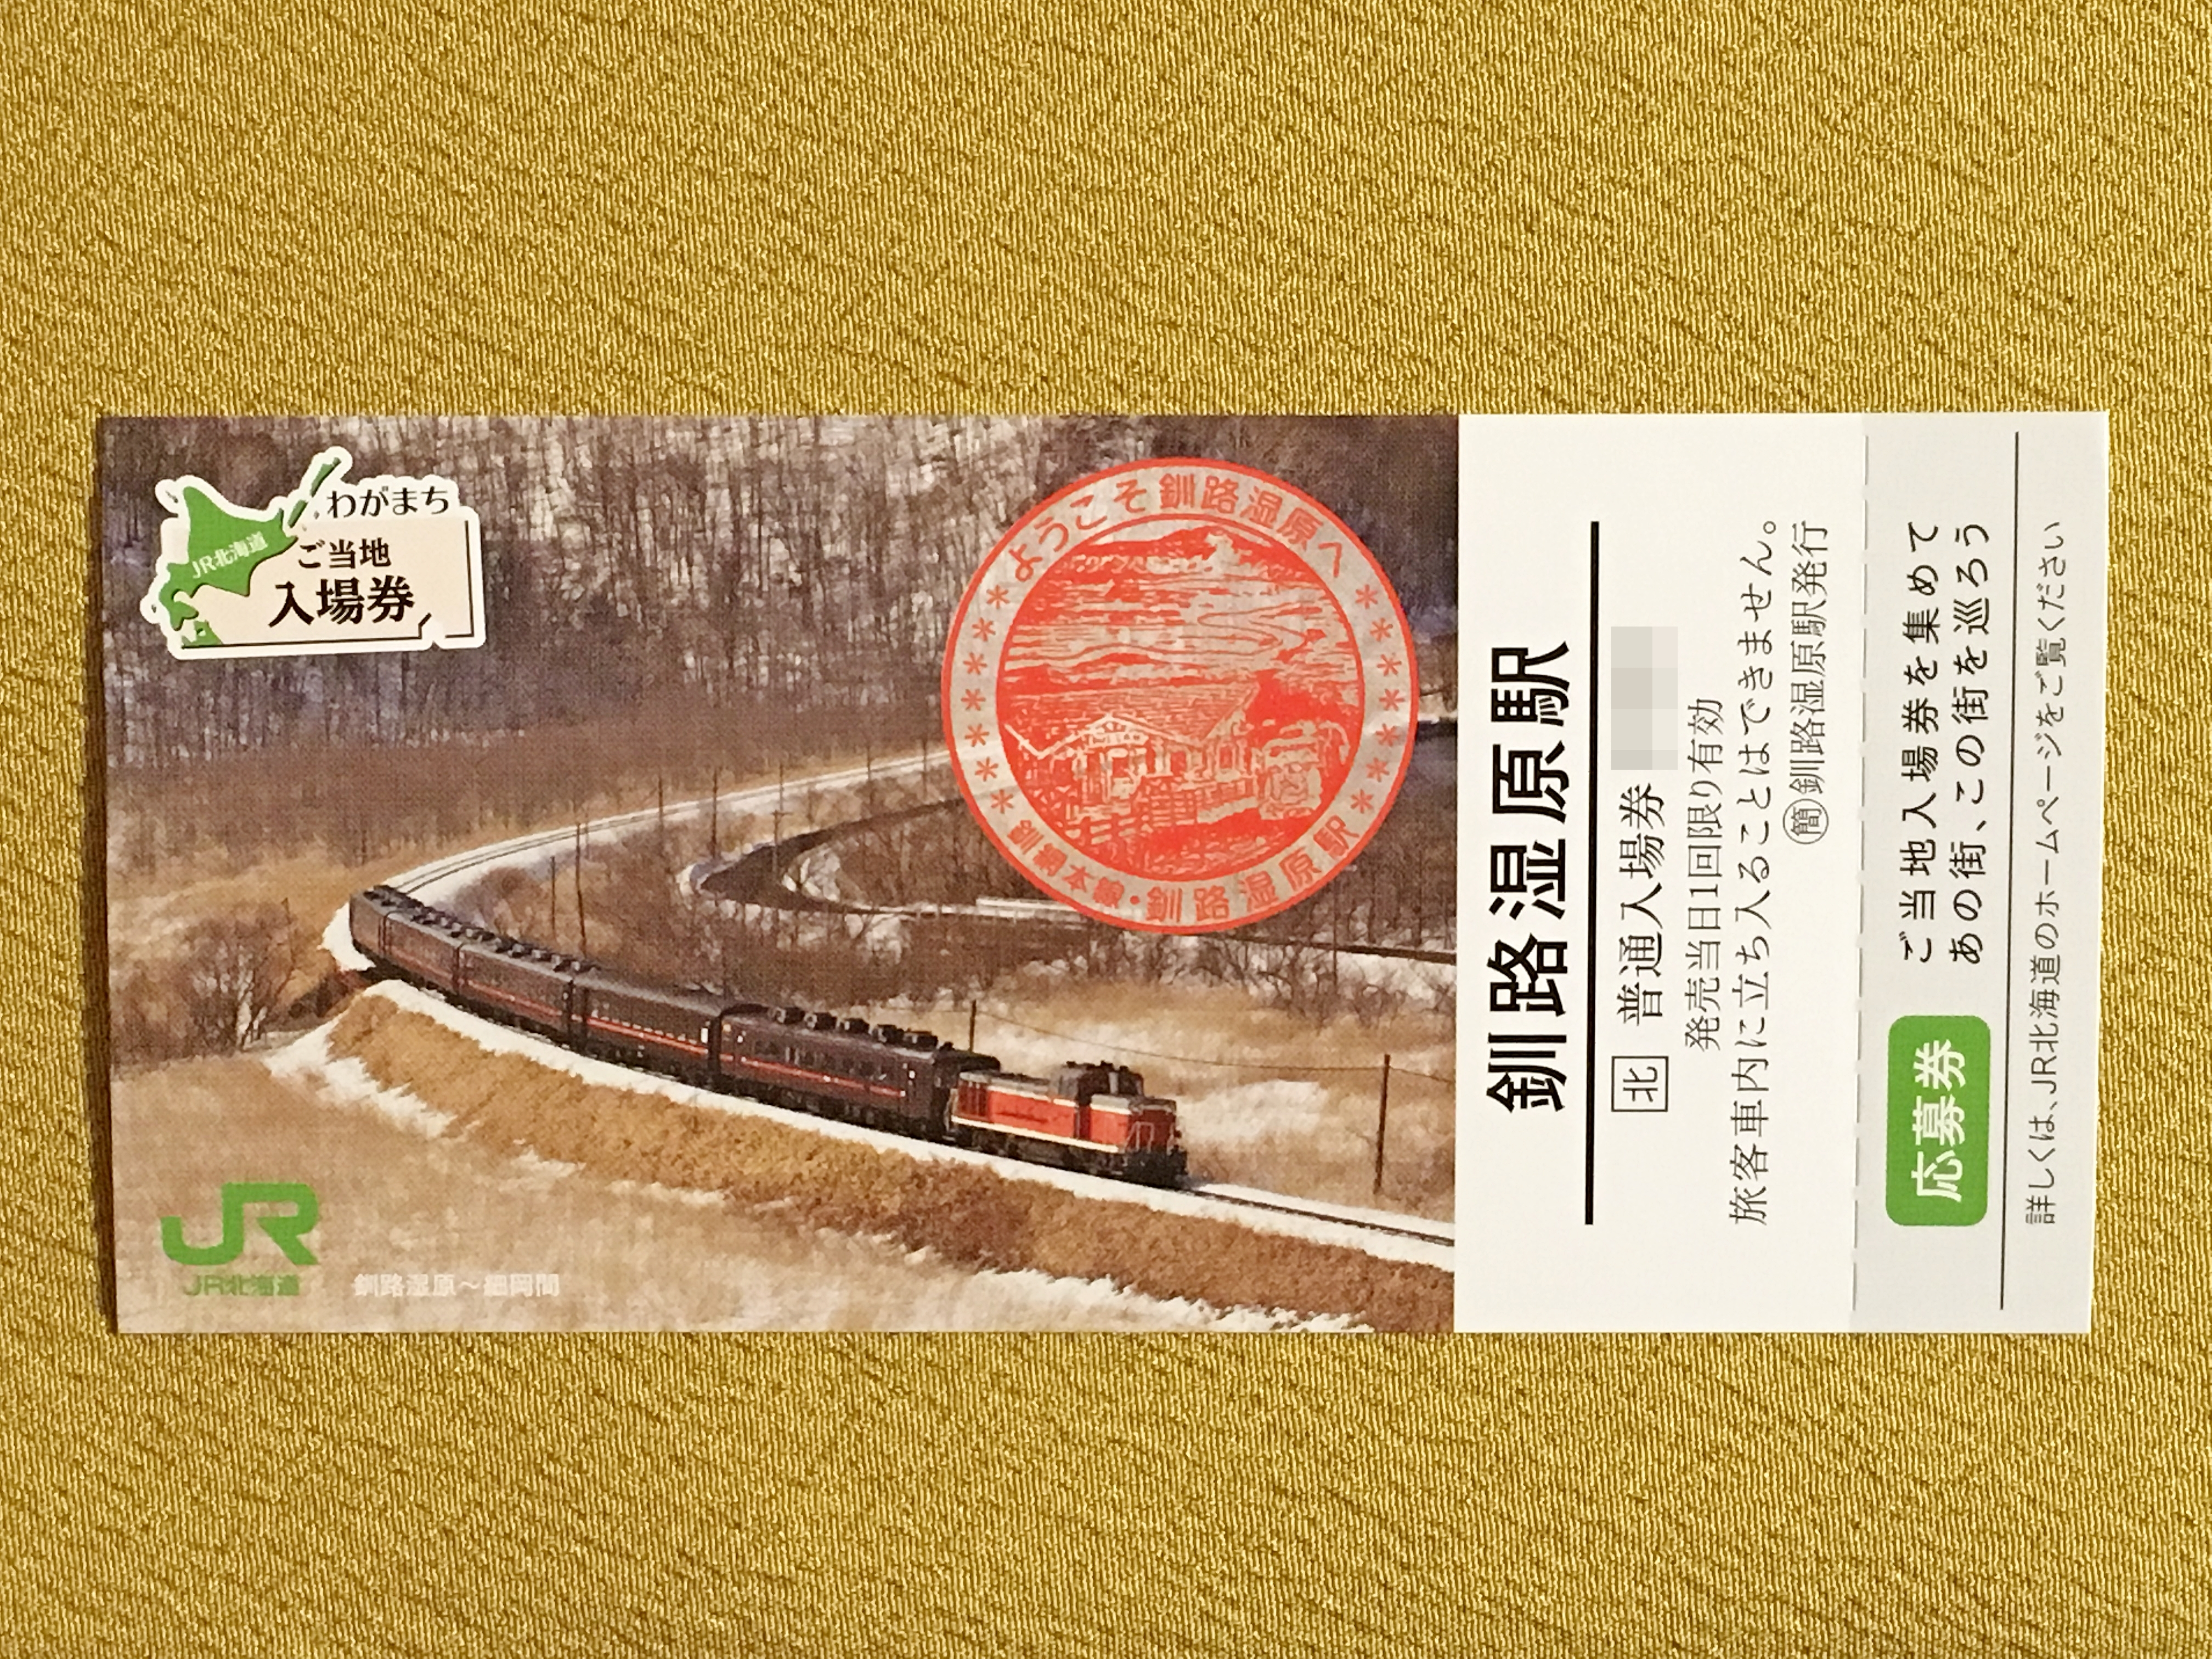 JR北海道ご当地入場券  釧路湿原駅表.JPG